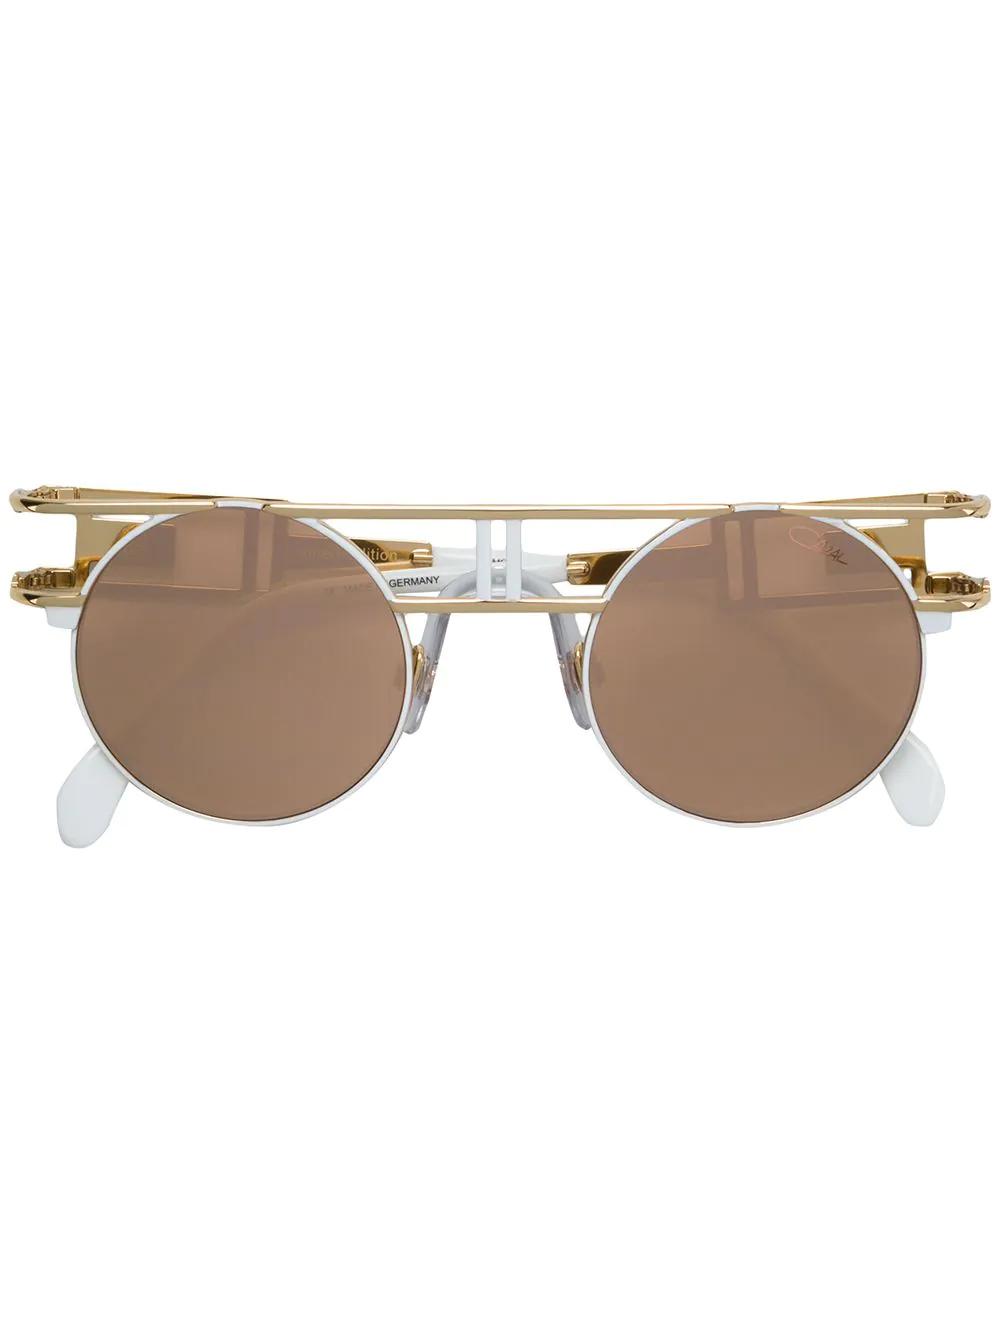 Cazal | солнцезащитные очки в круглой оправе | Clouty